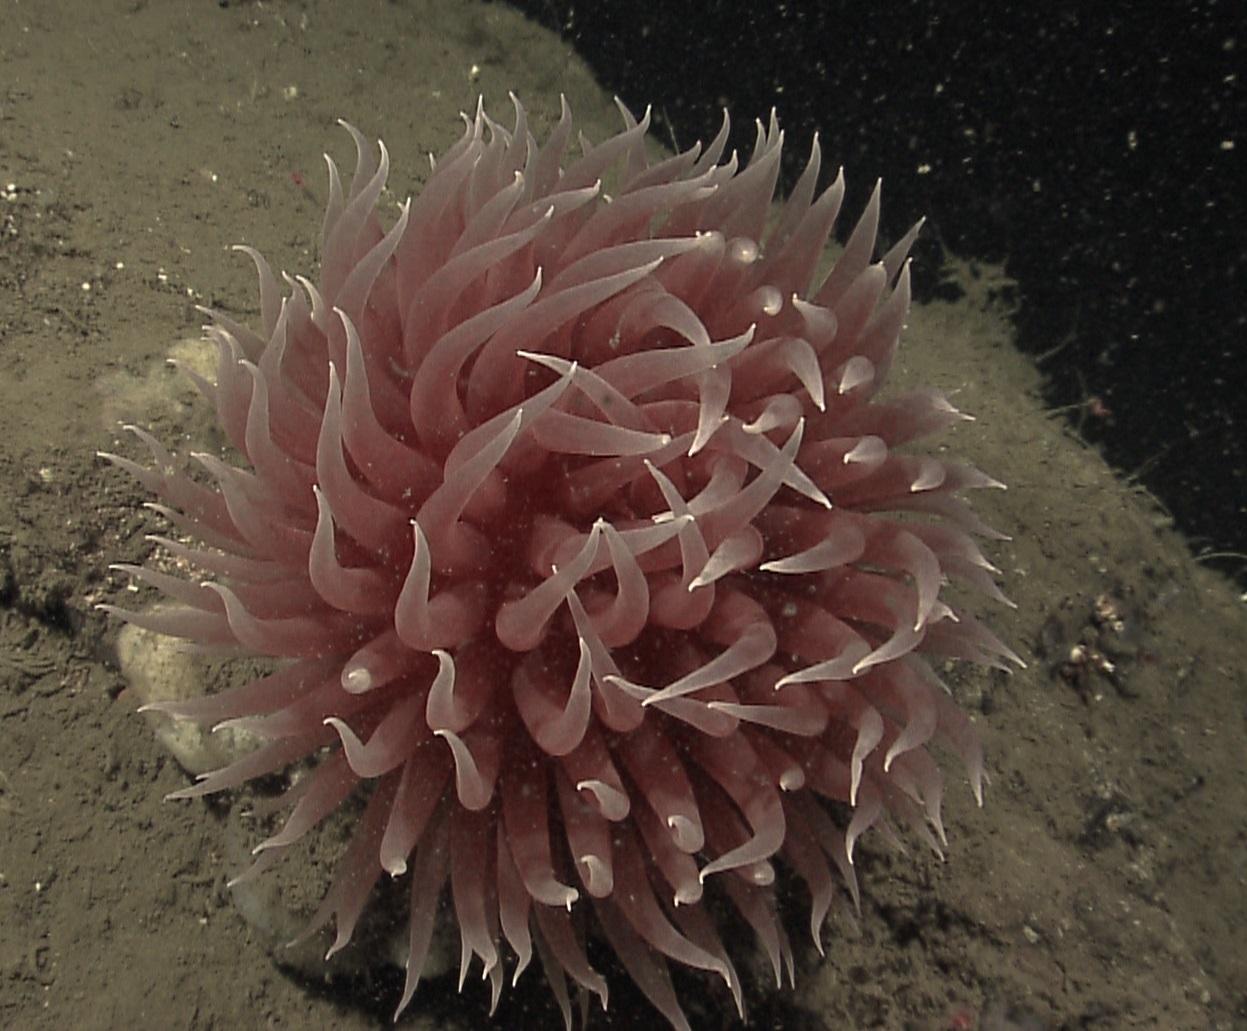 Image of tentacle shedding anemone